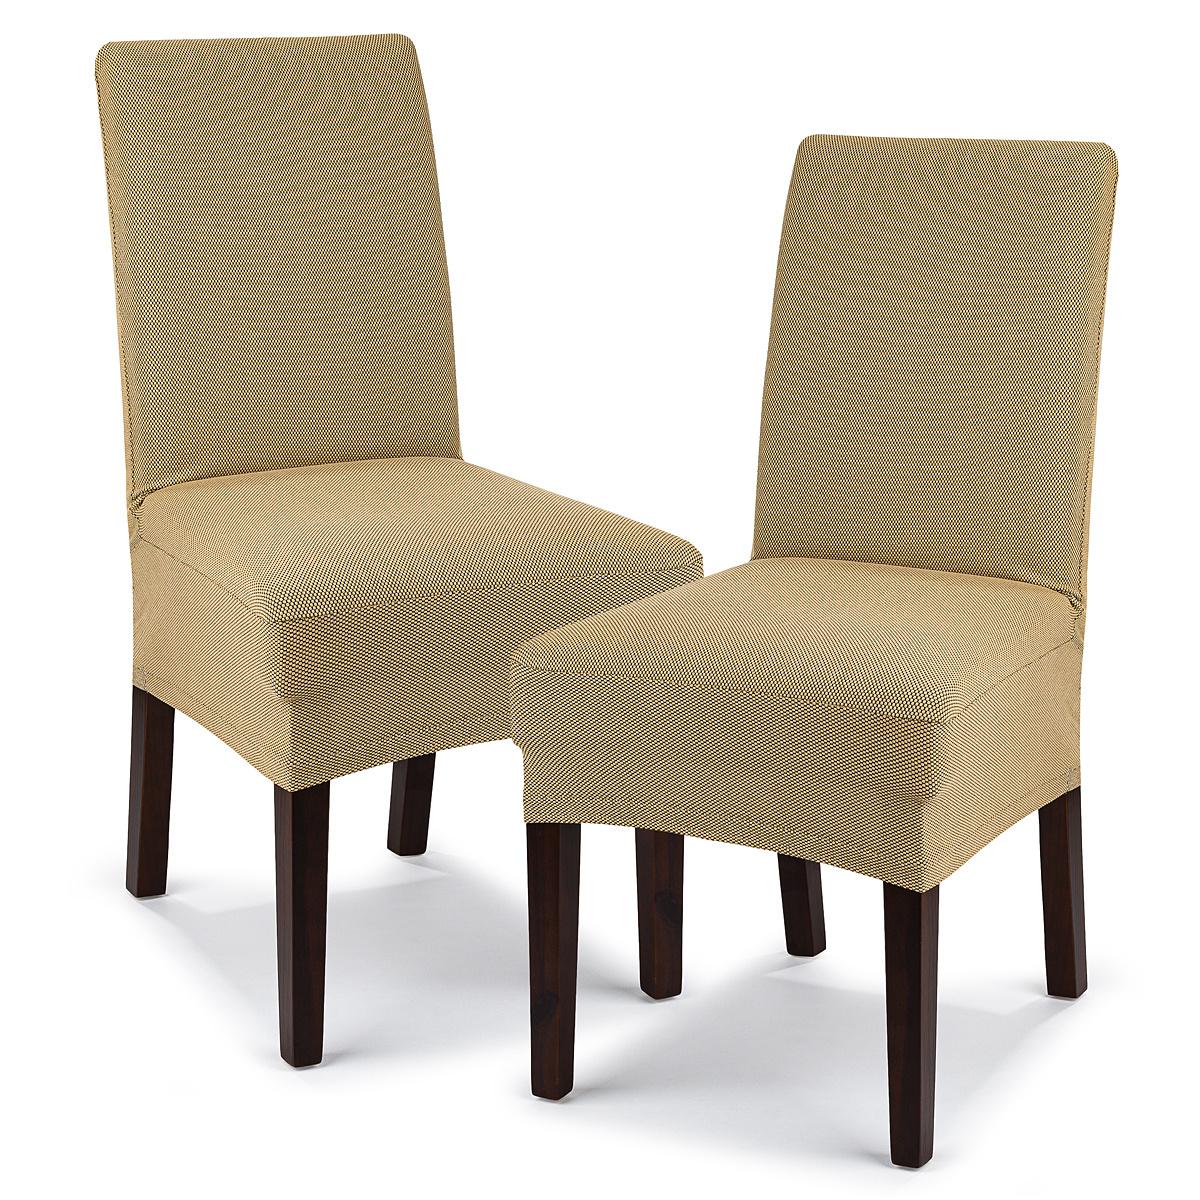 4Home Multielastický potah na židli Comfort béžová, 40 - 50 cm, sada 2 ks